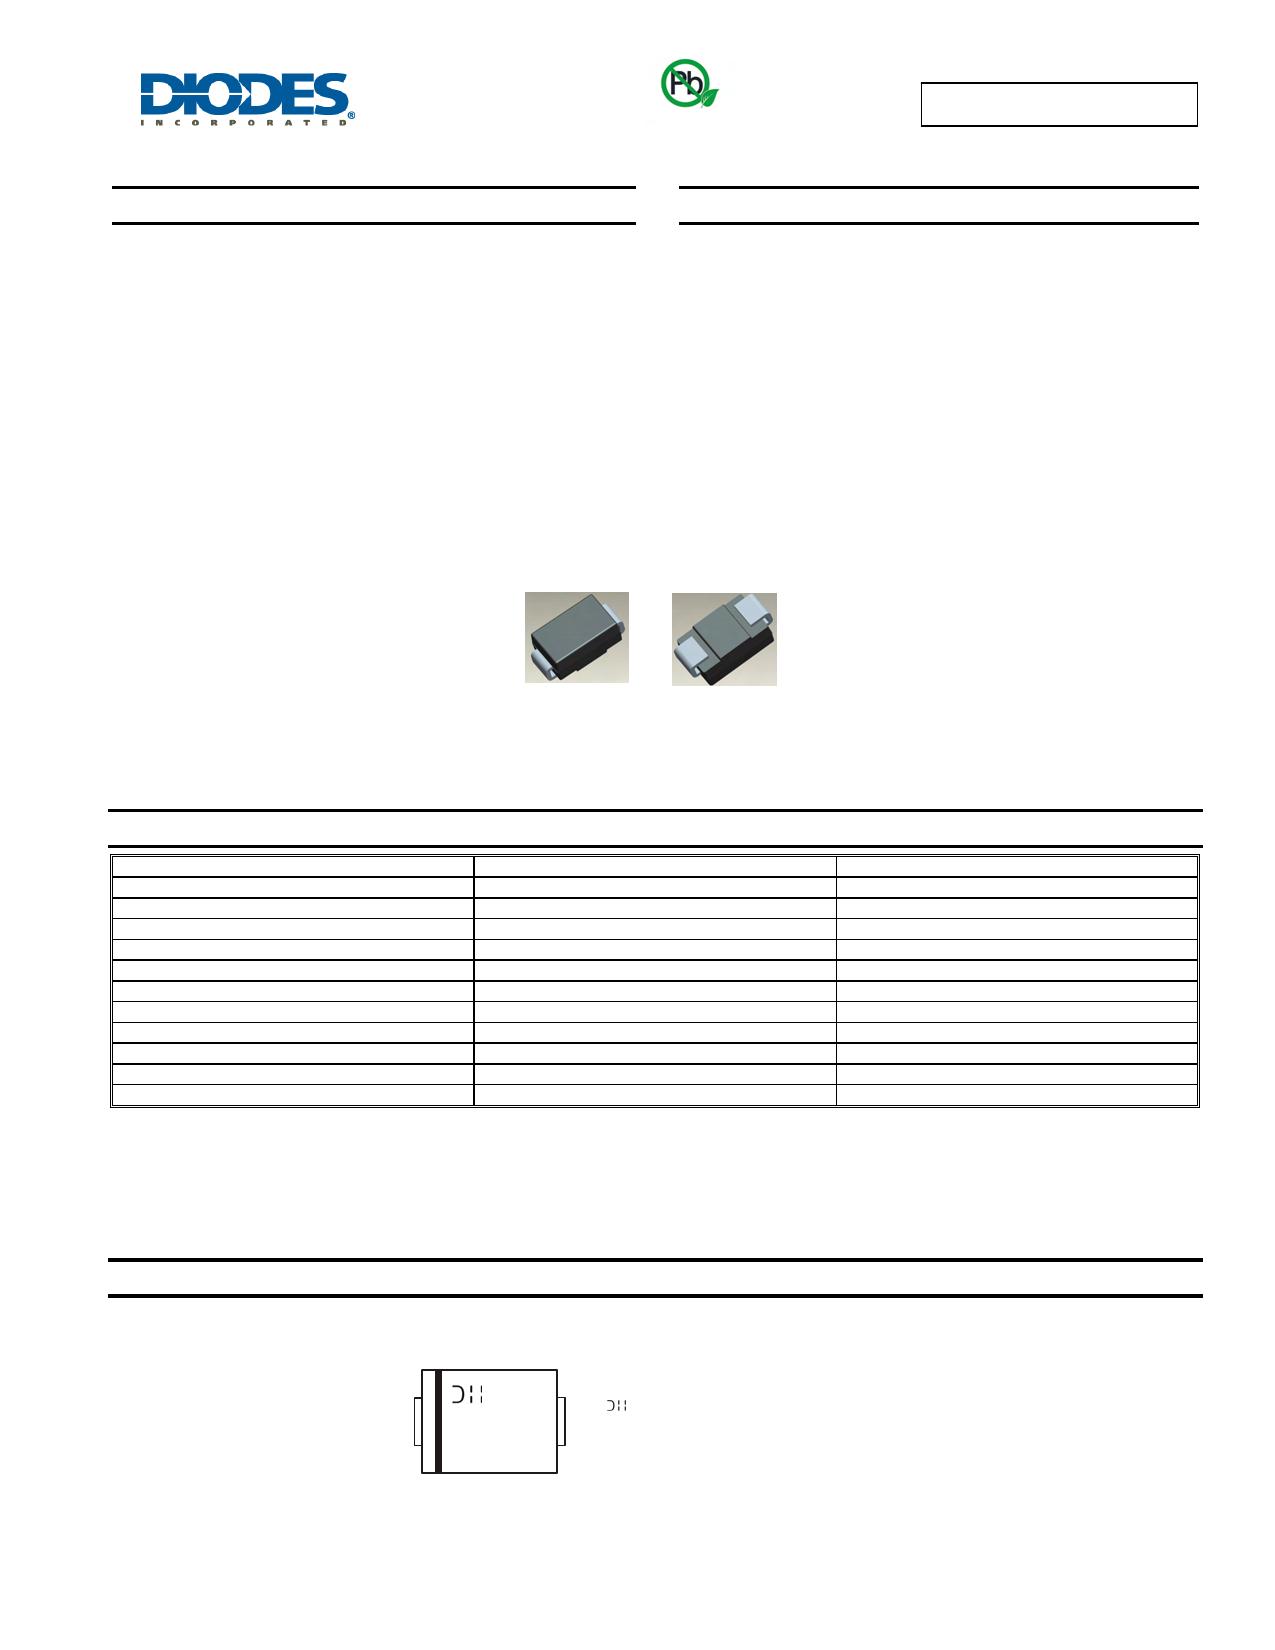 TB3100M datasheet